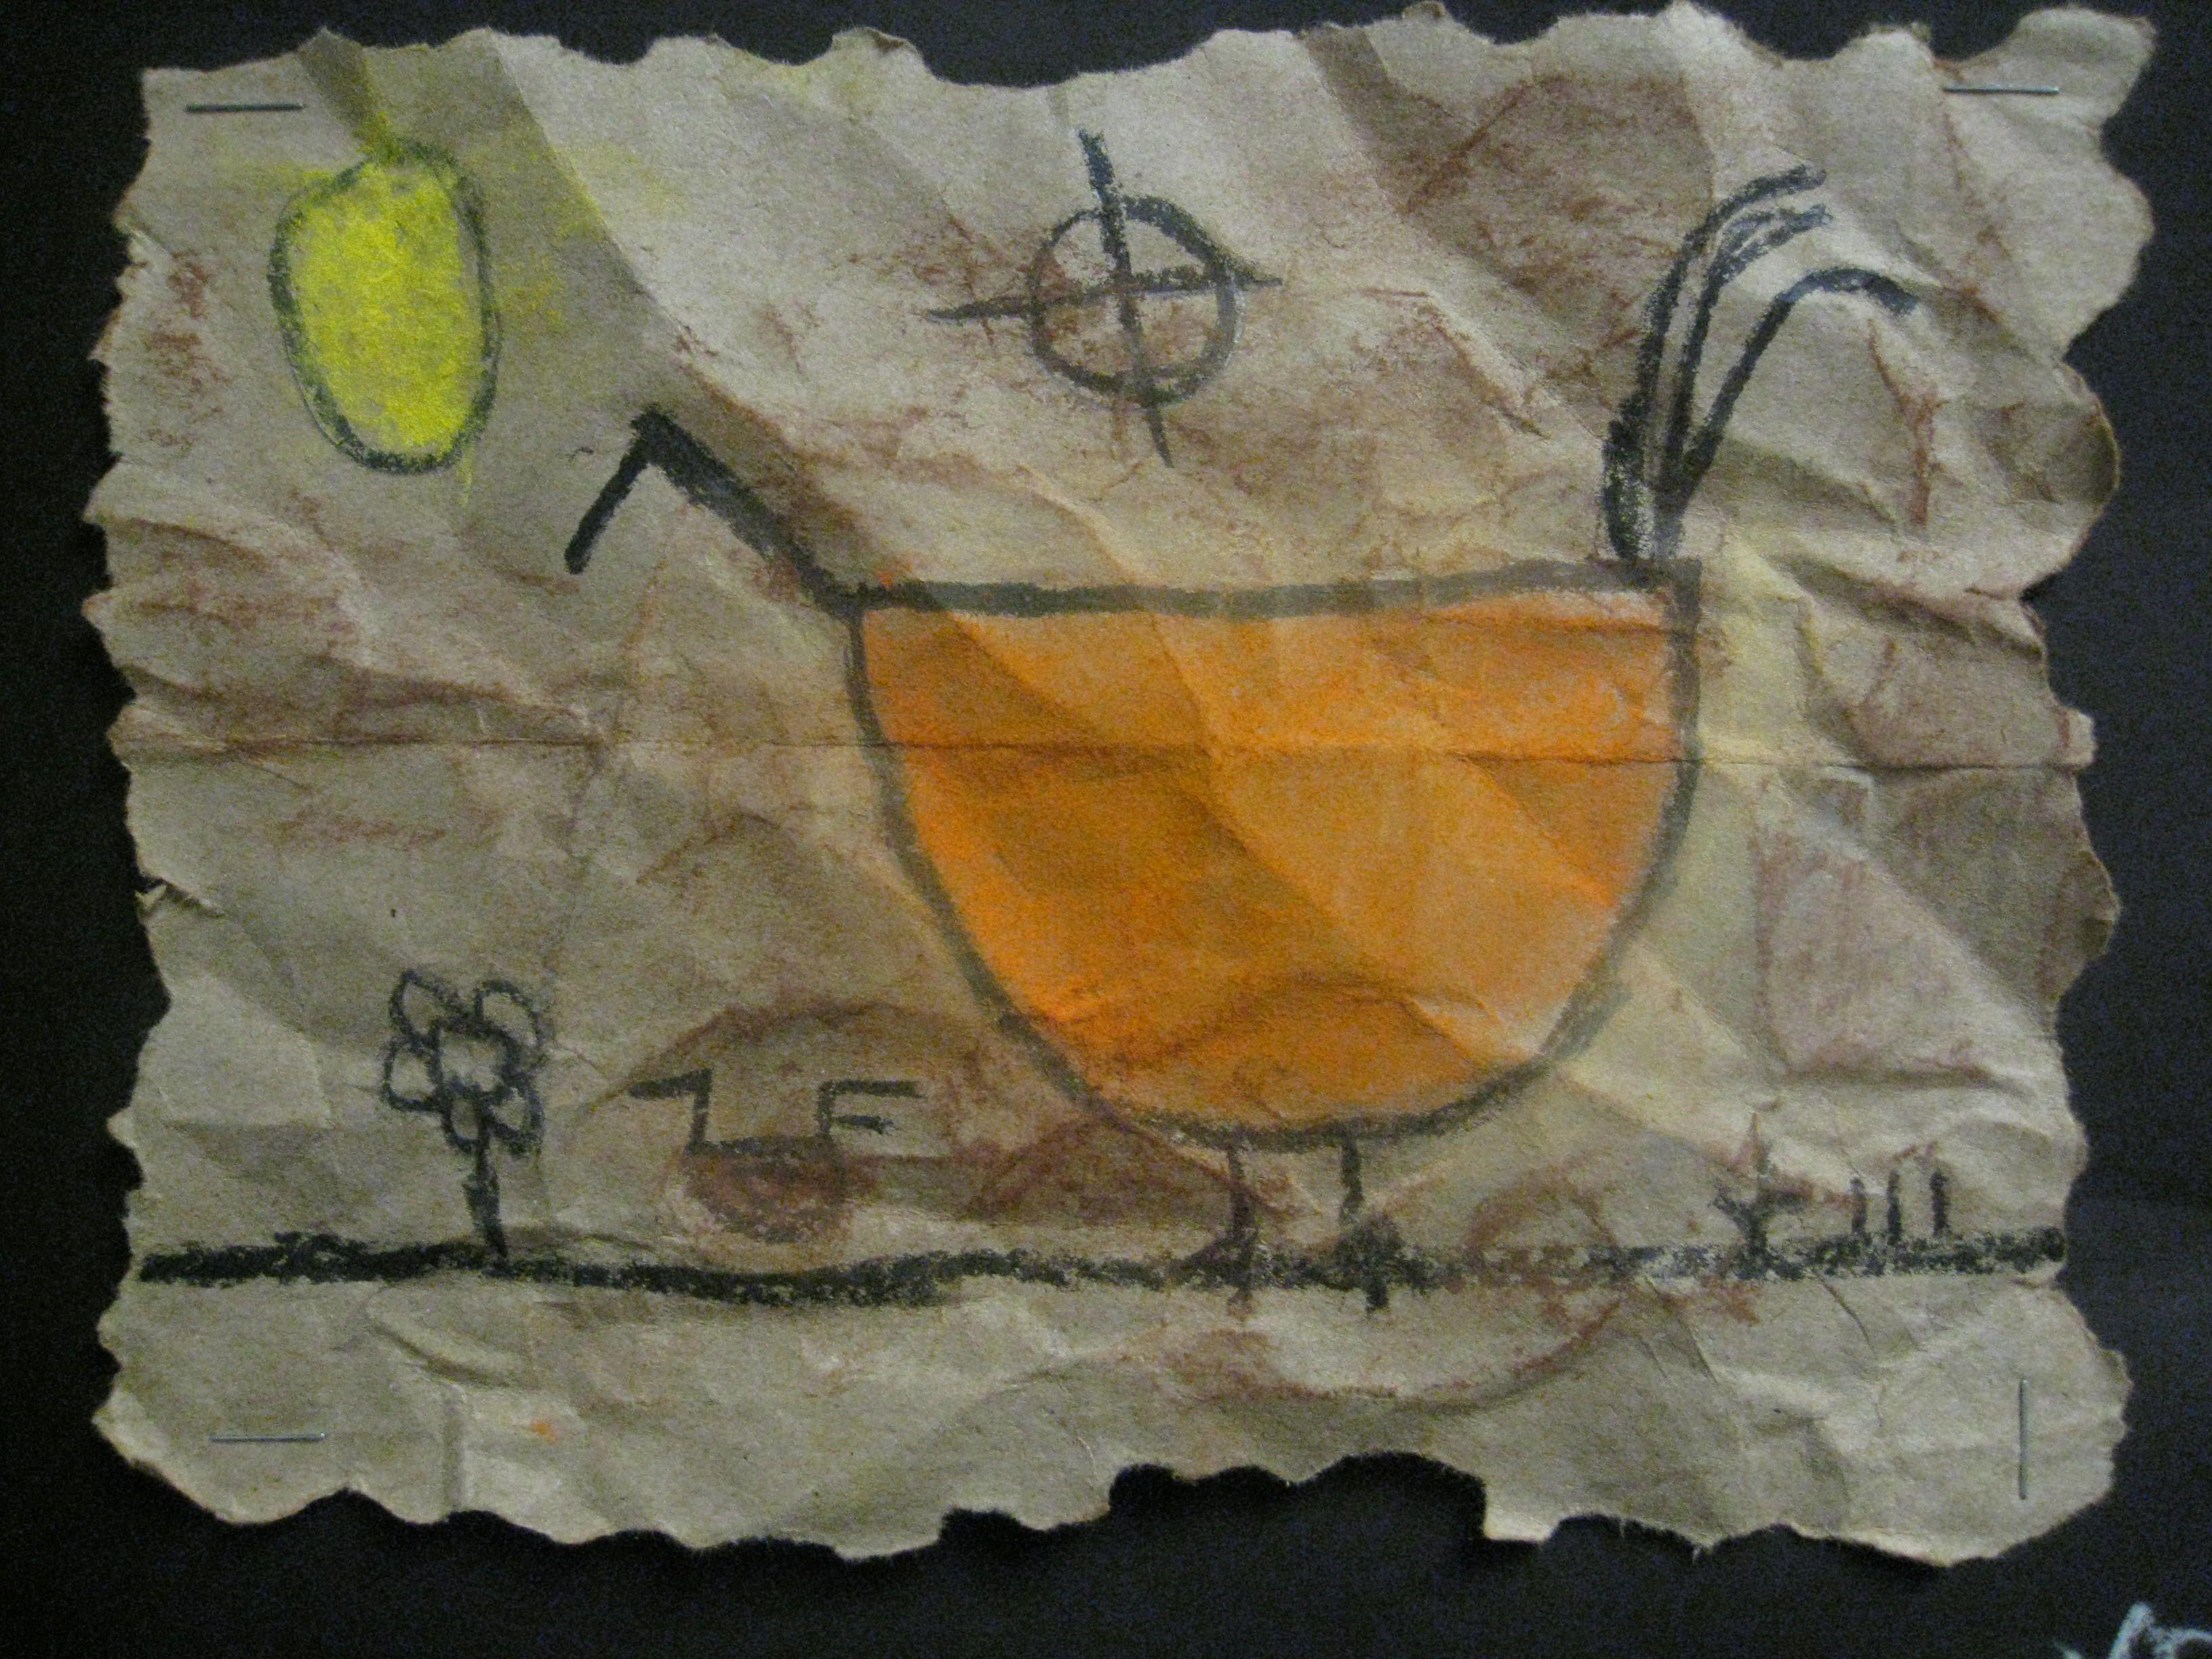 Caveman Art Ks2 : Cave art ks related keywords long tail